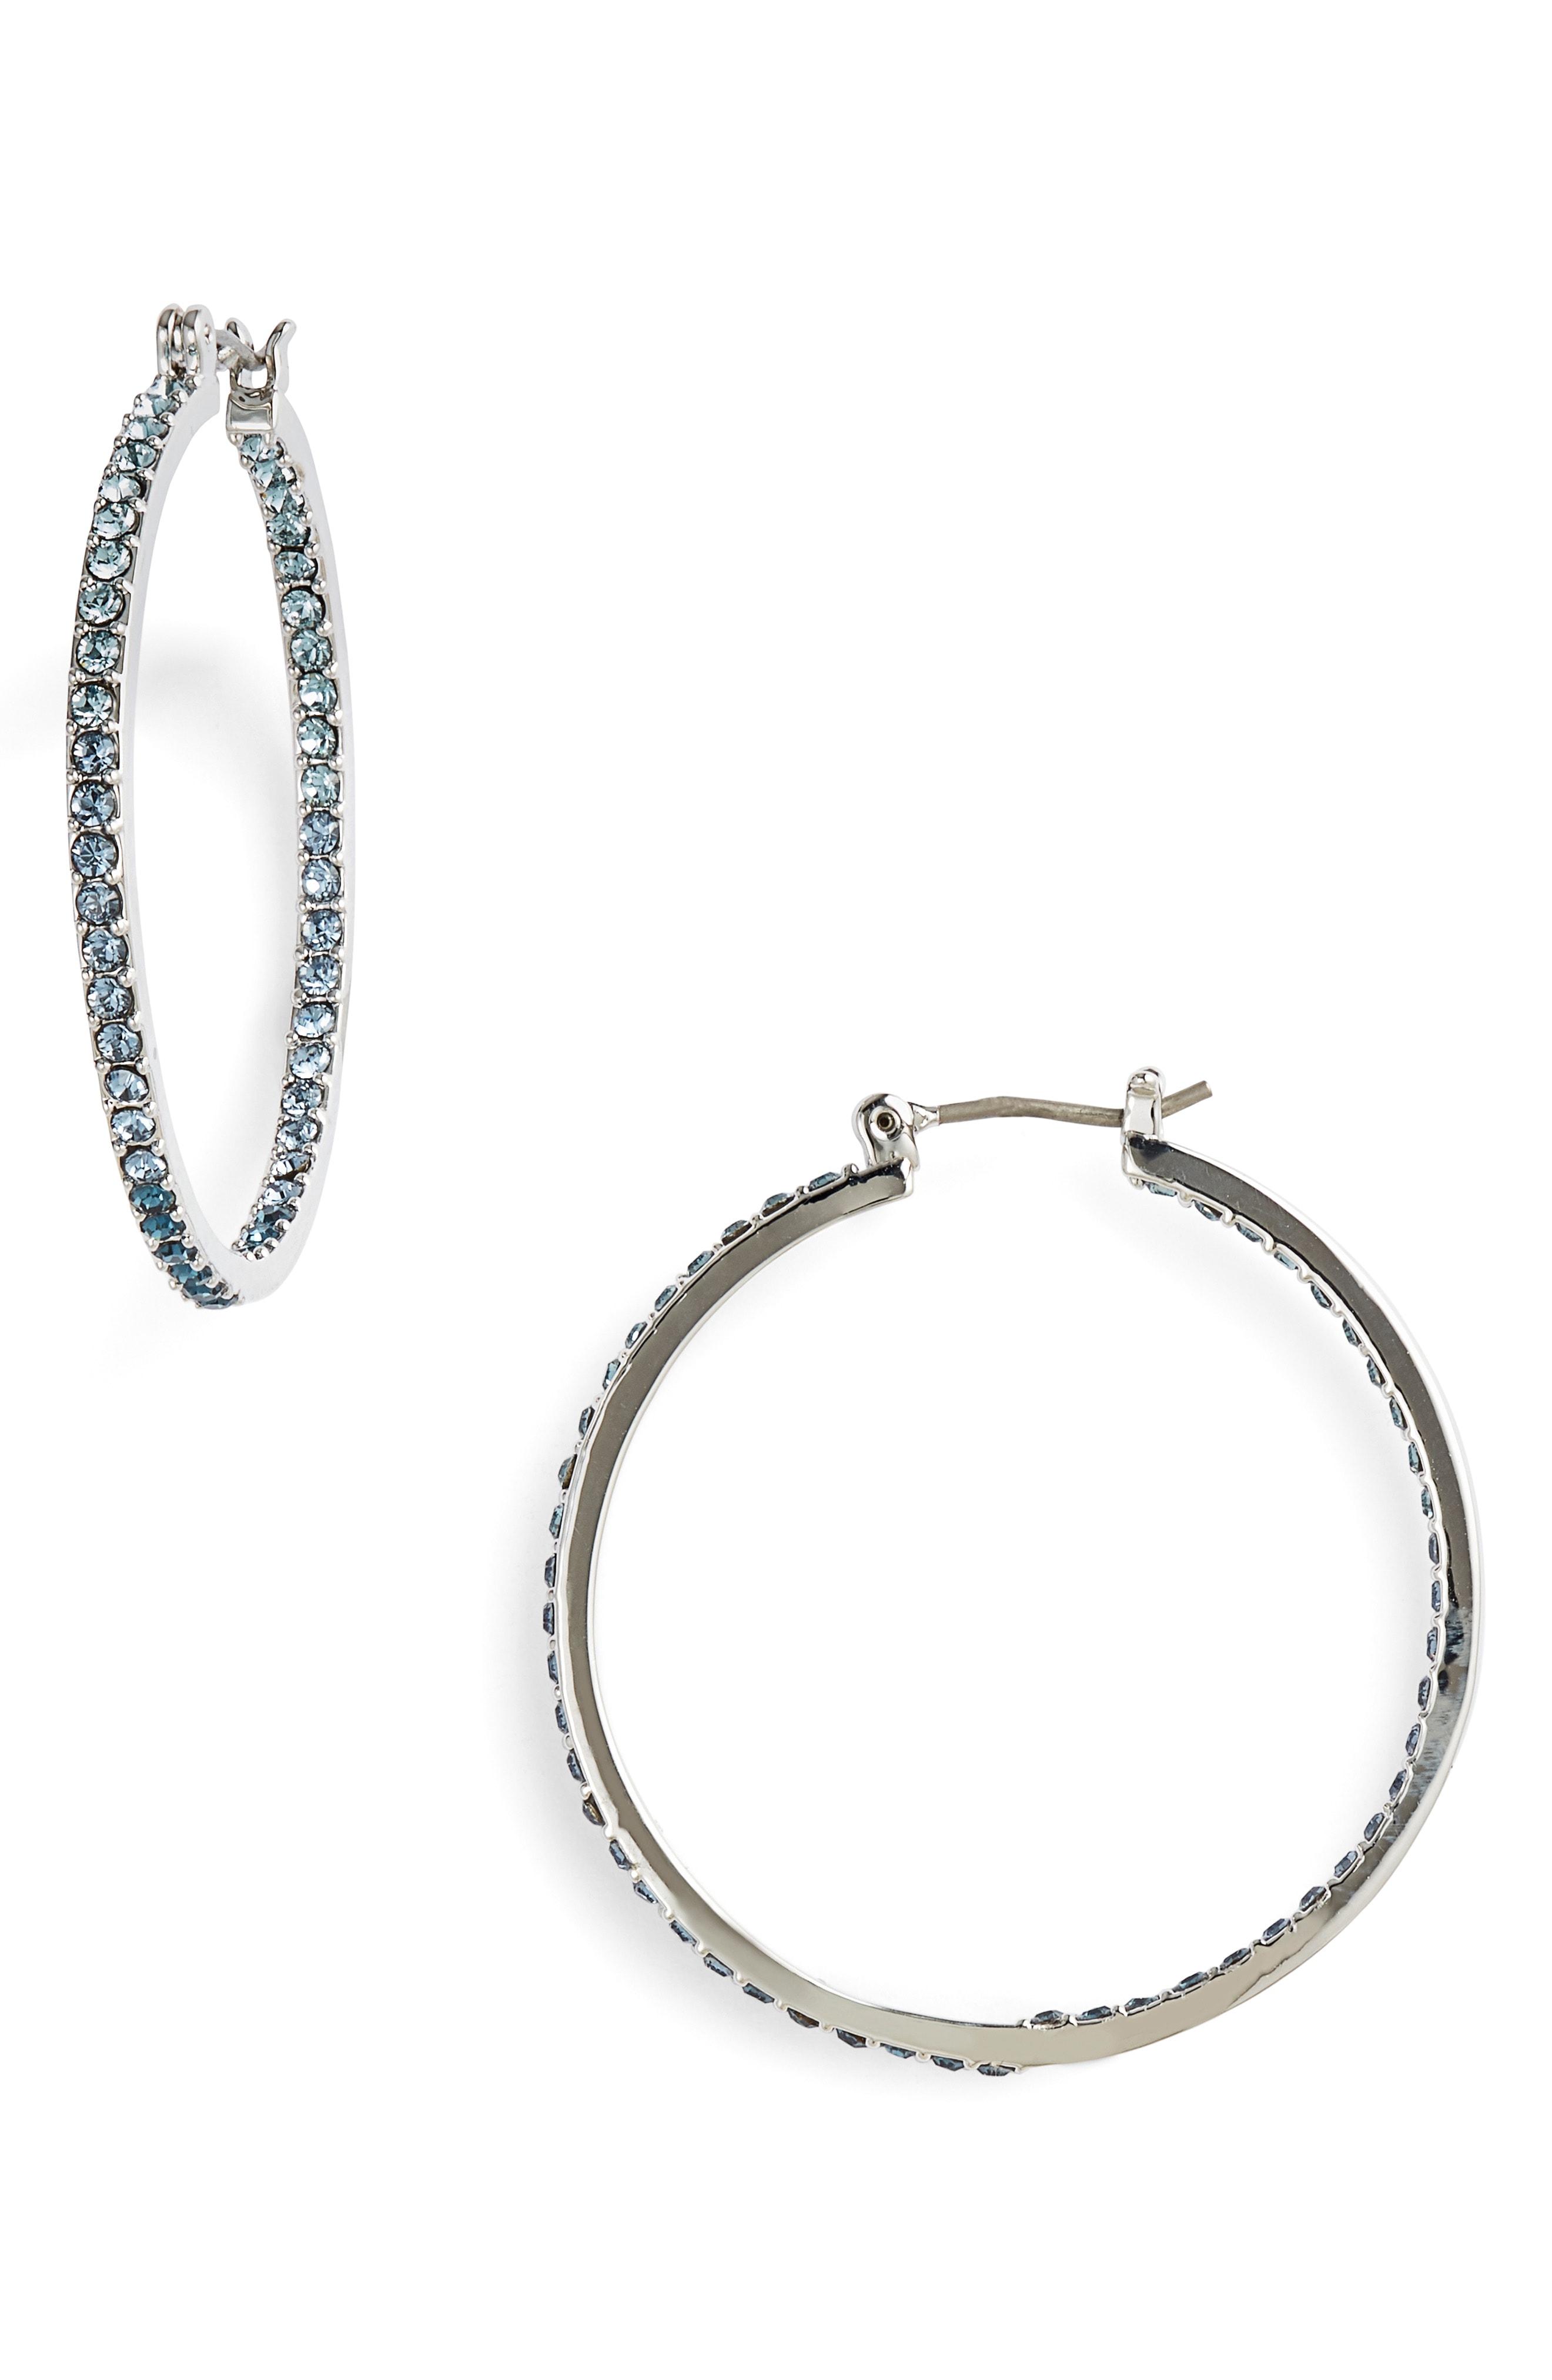 Givenchy Pav Crystal Hoop Earrings